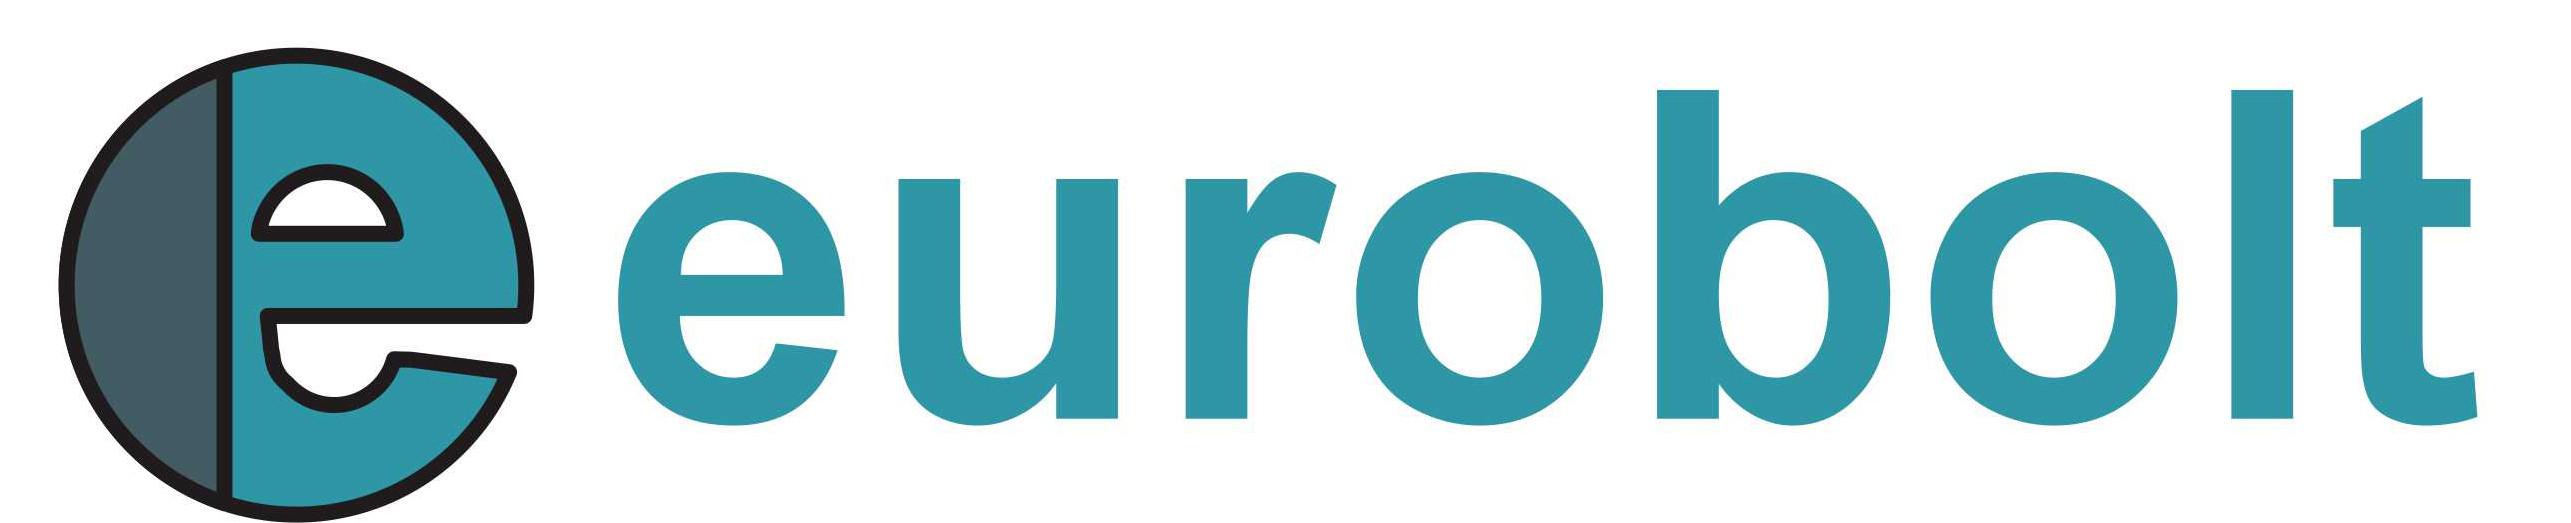 eurobolt logo2